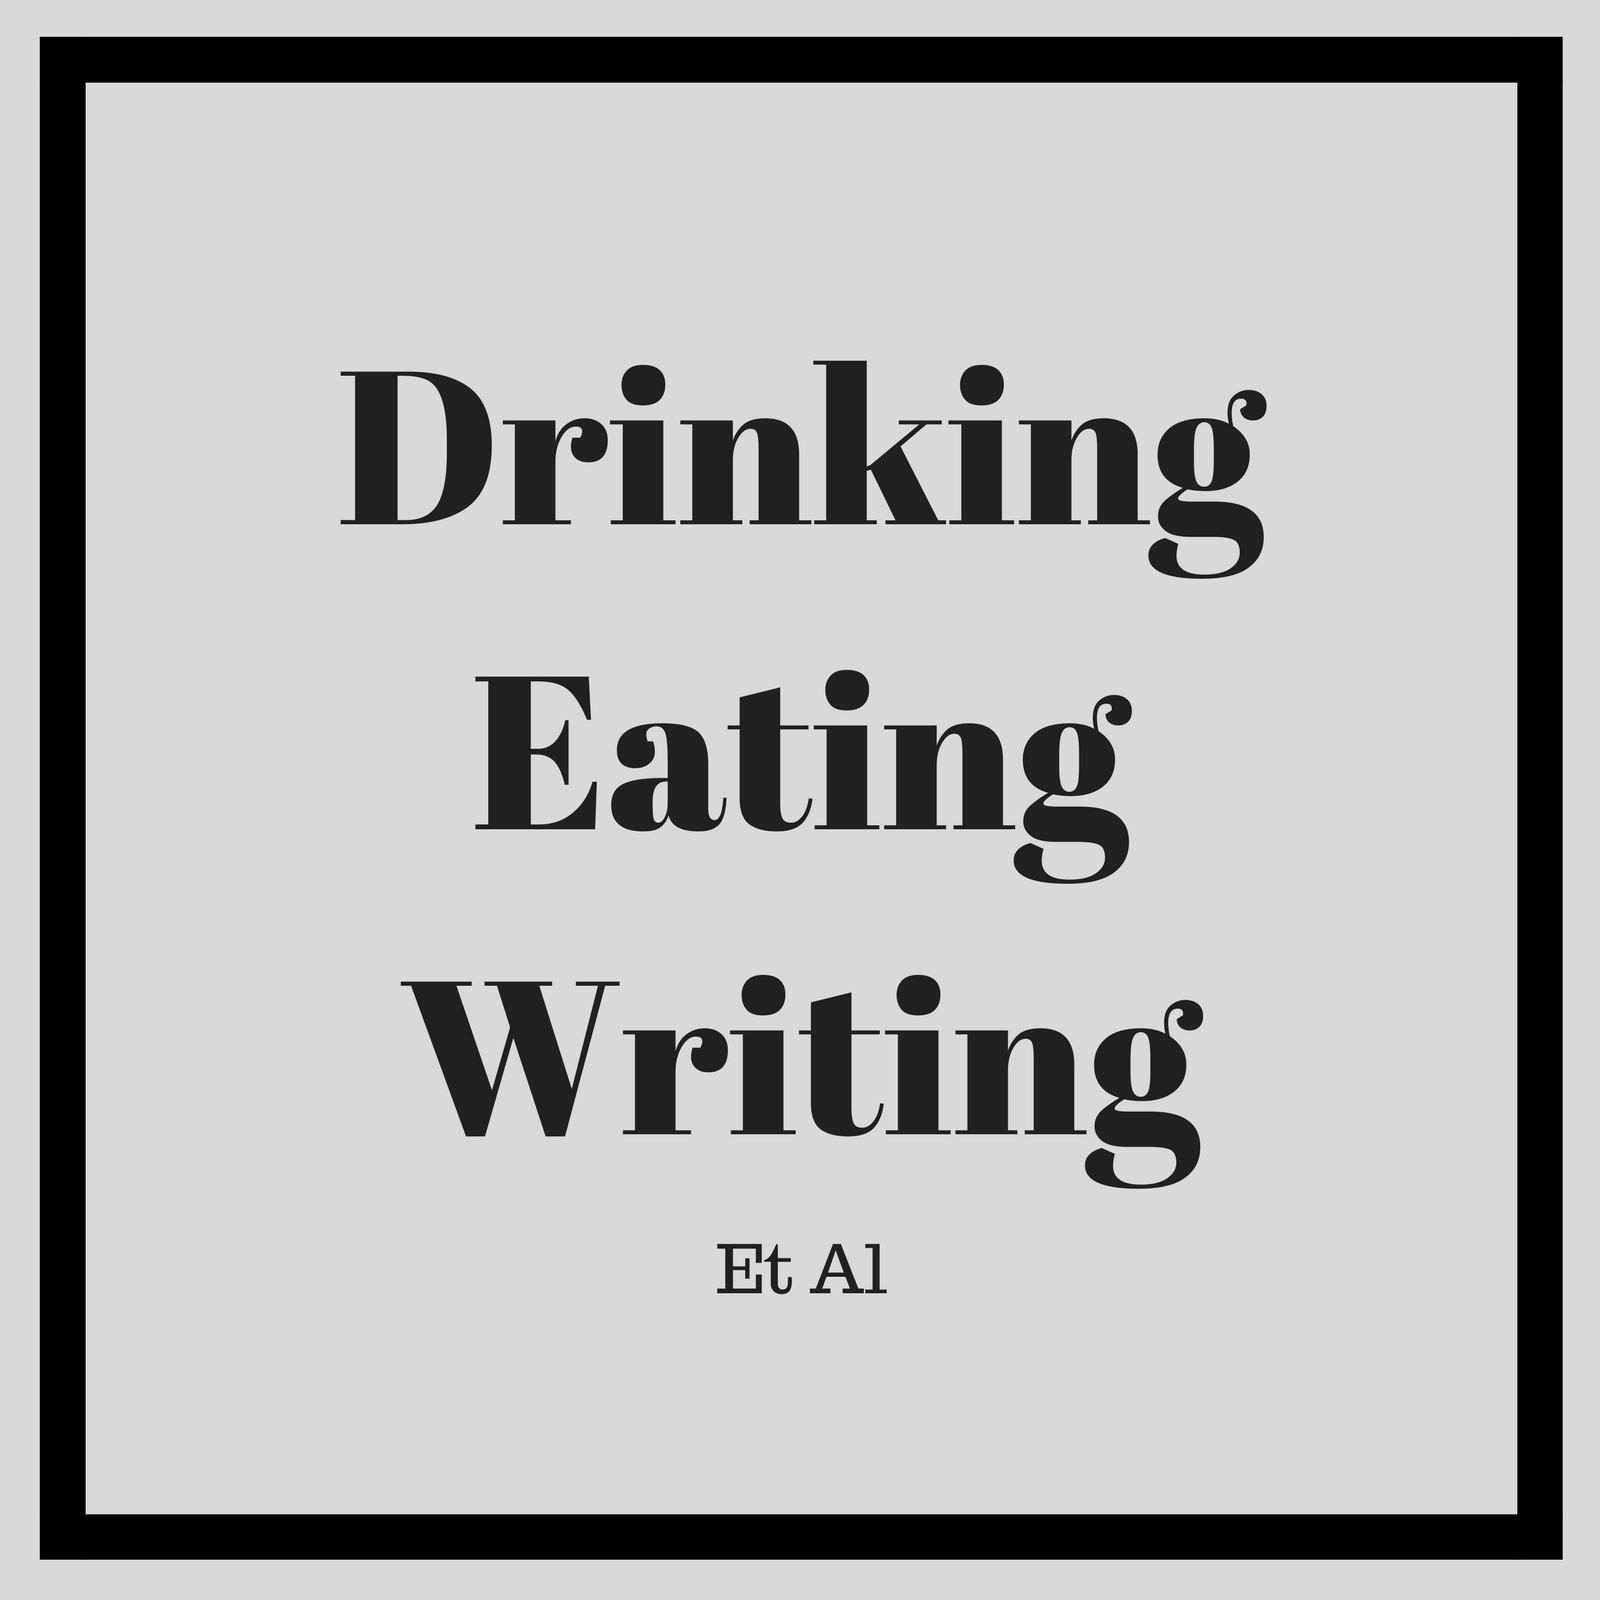 Drinking, Eating, Writing et al